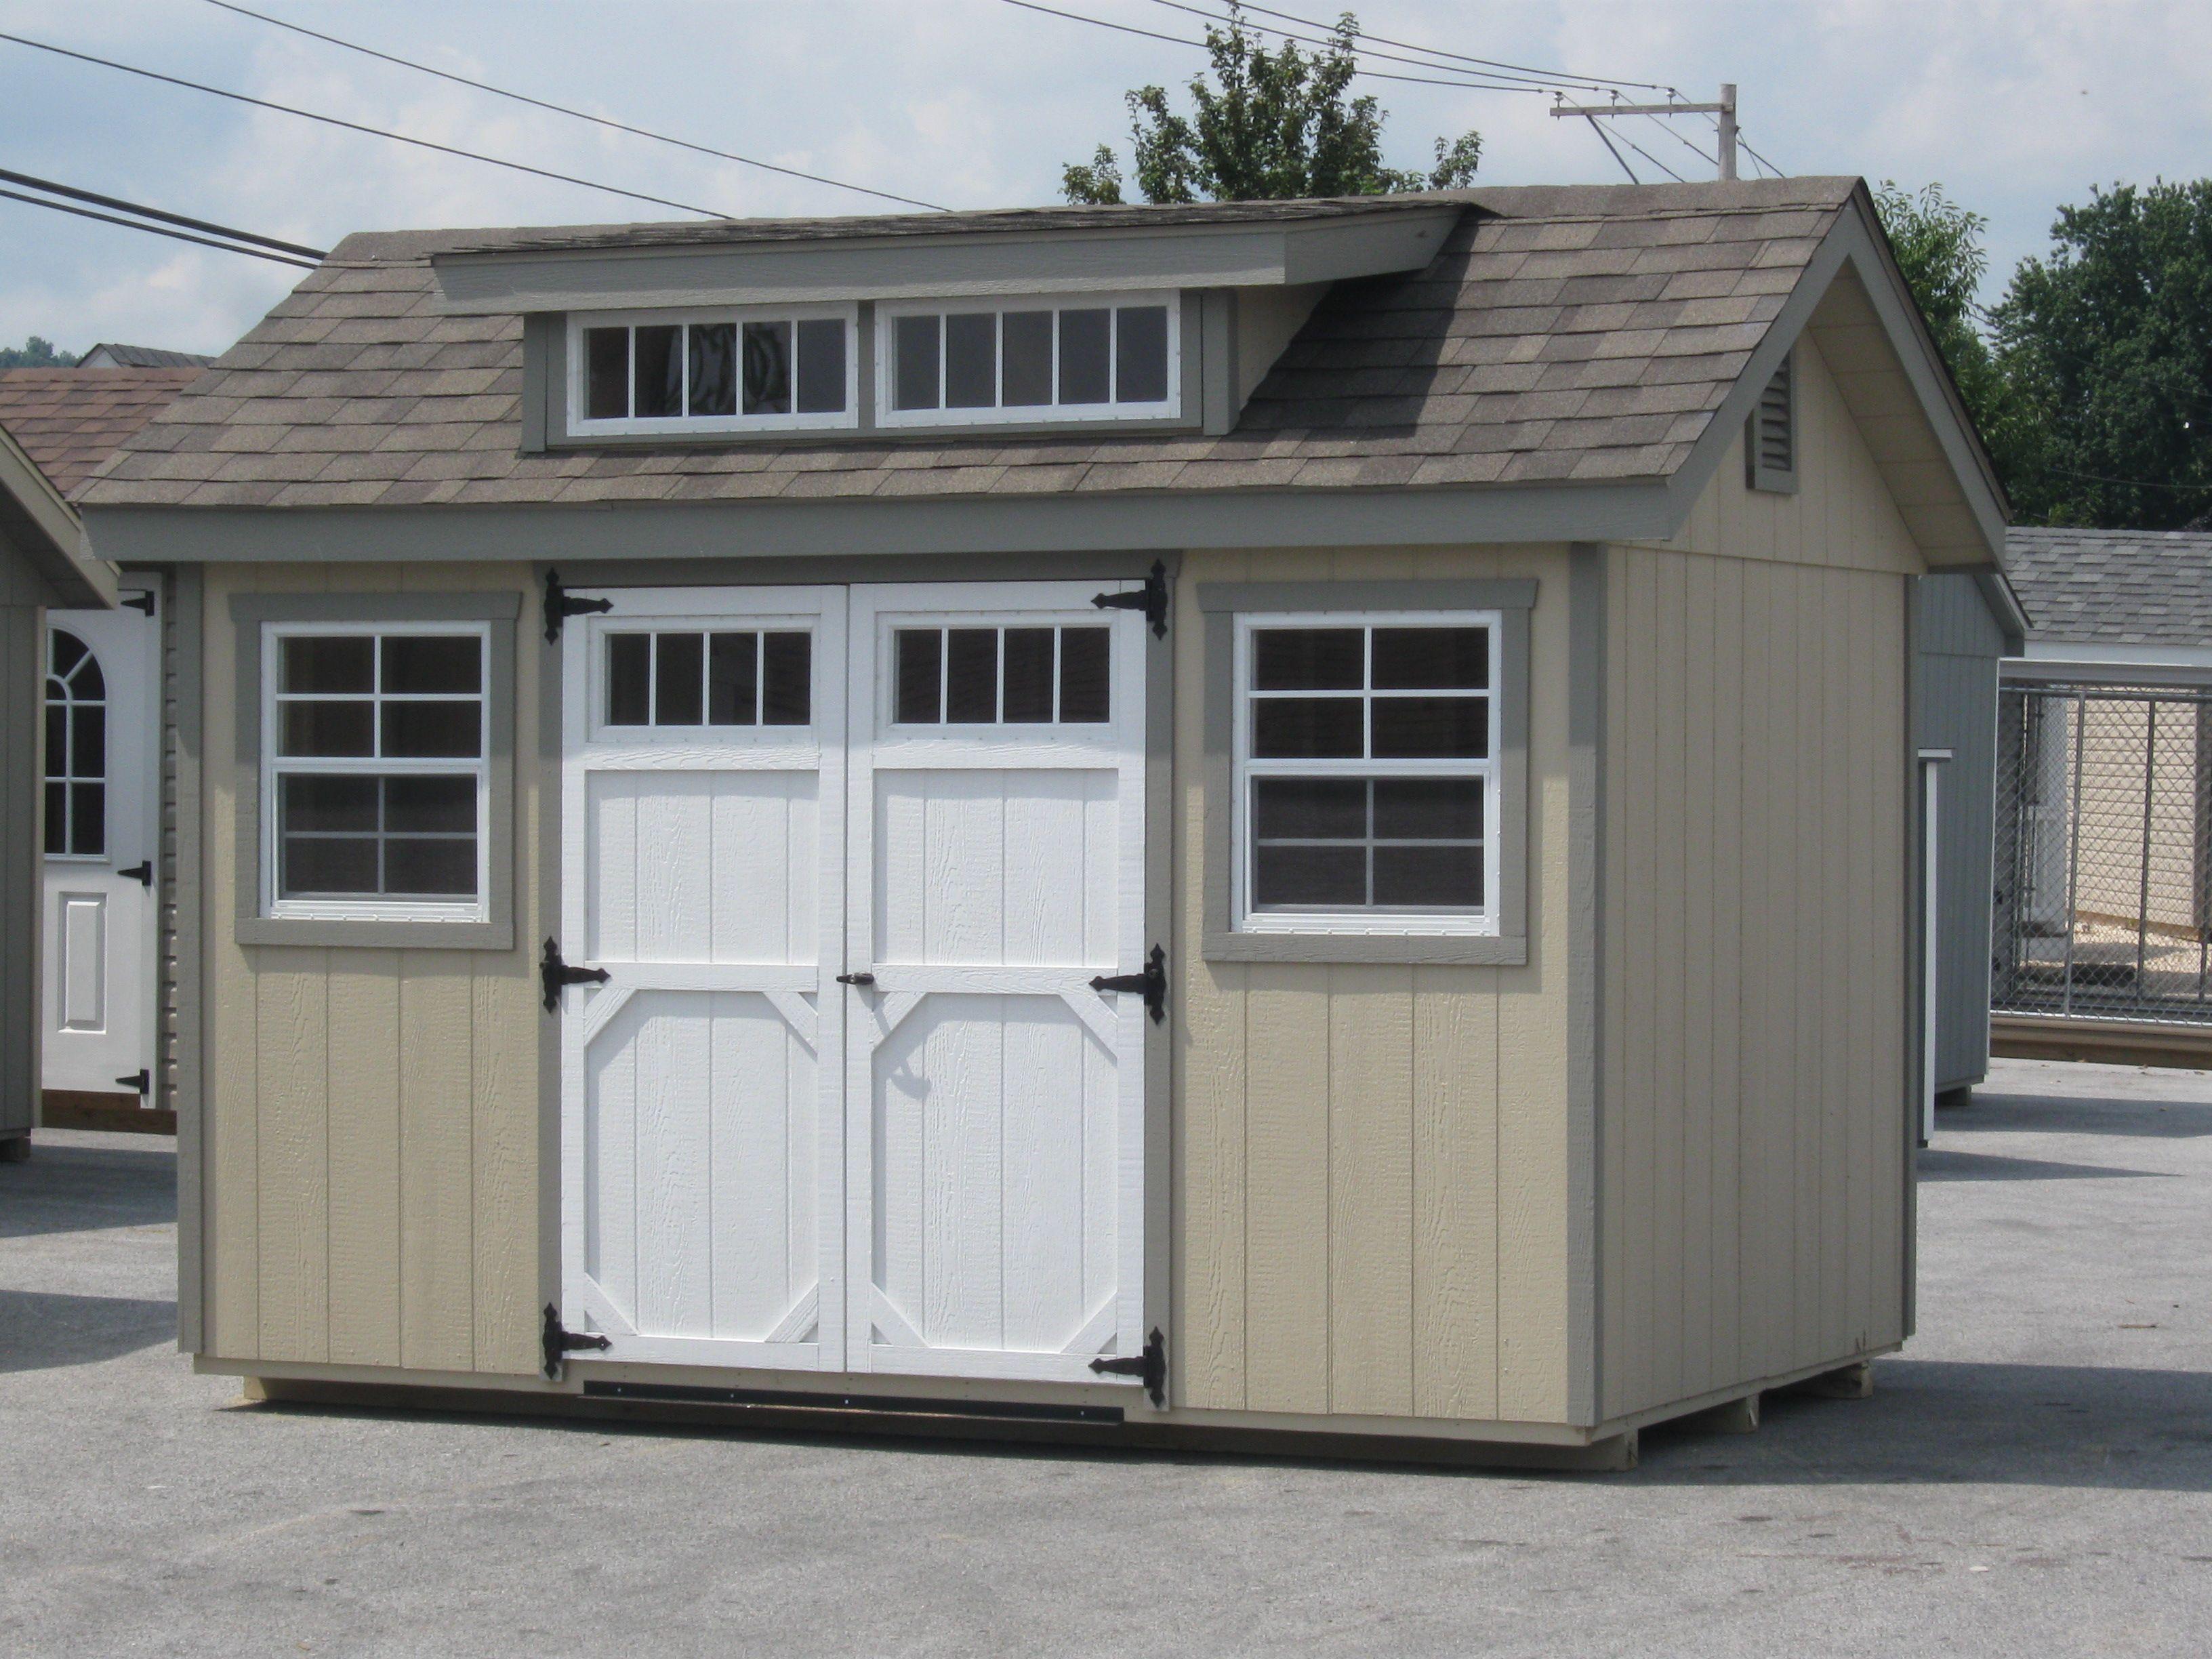 barn horizon garden sheds quaker storage structures garage garages shed site style amish built on